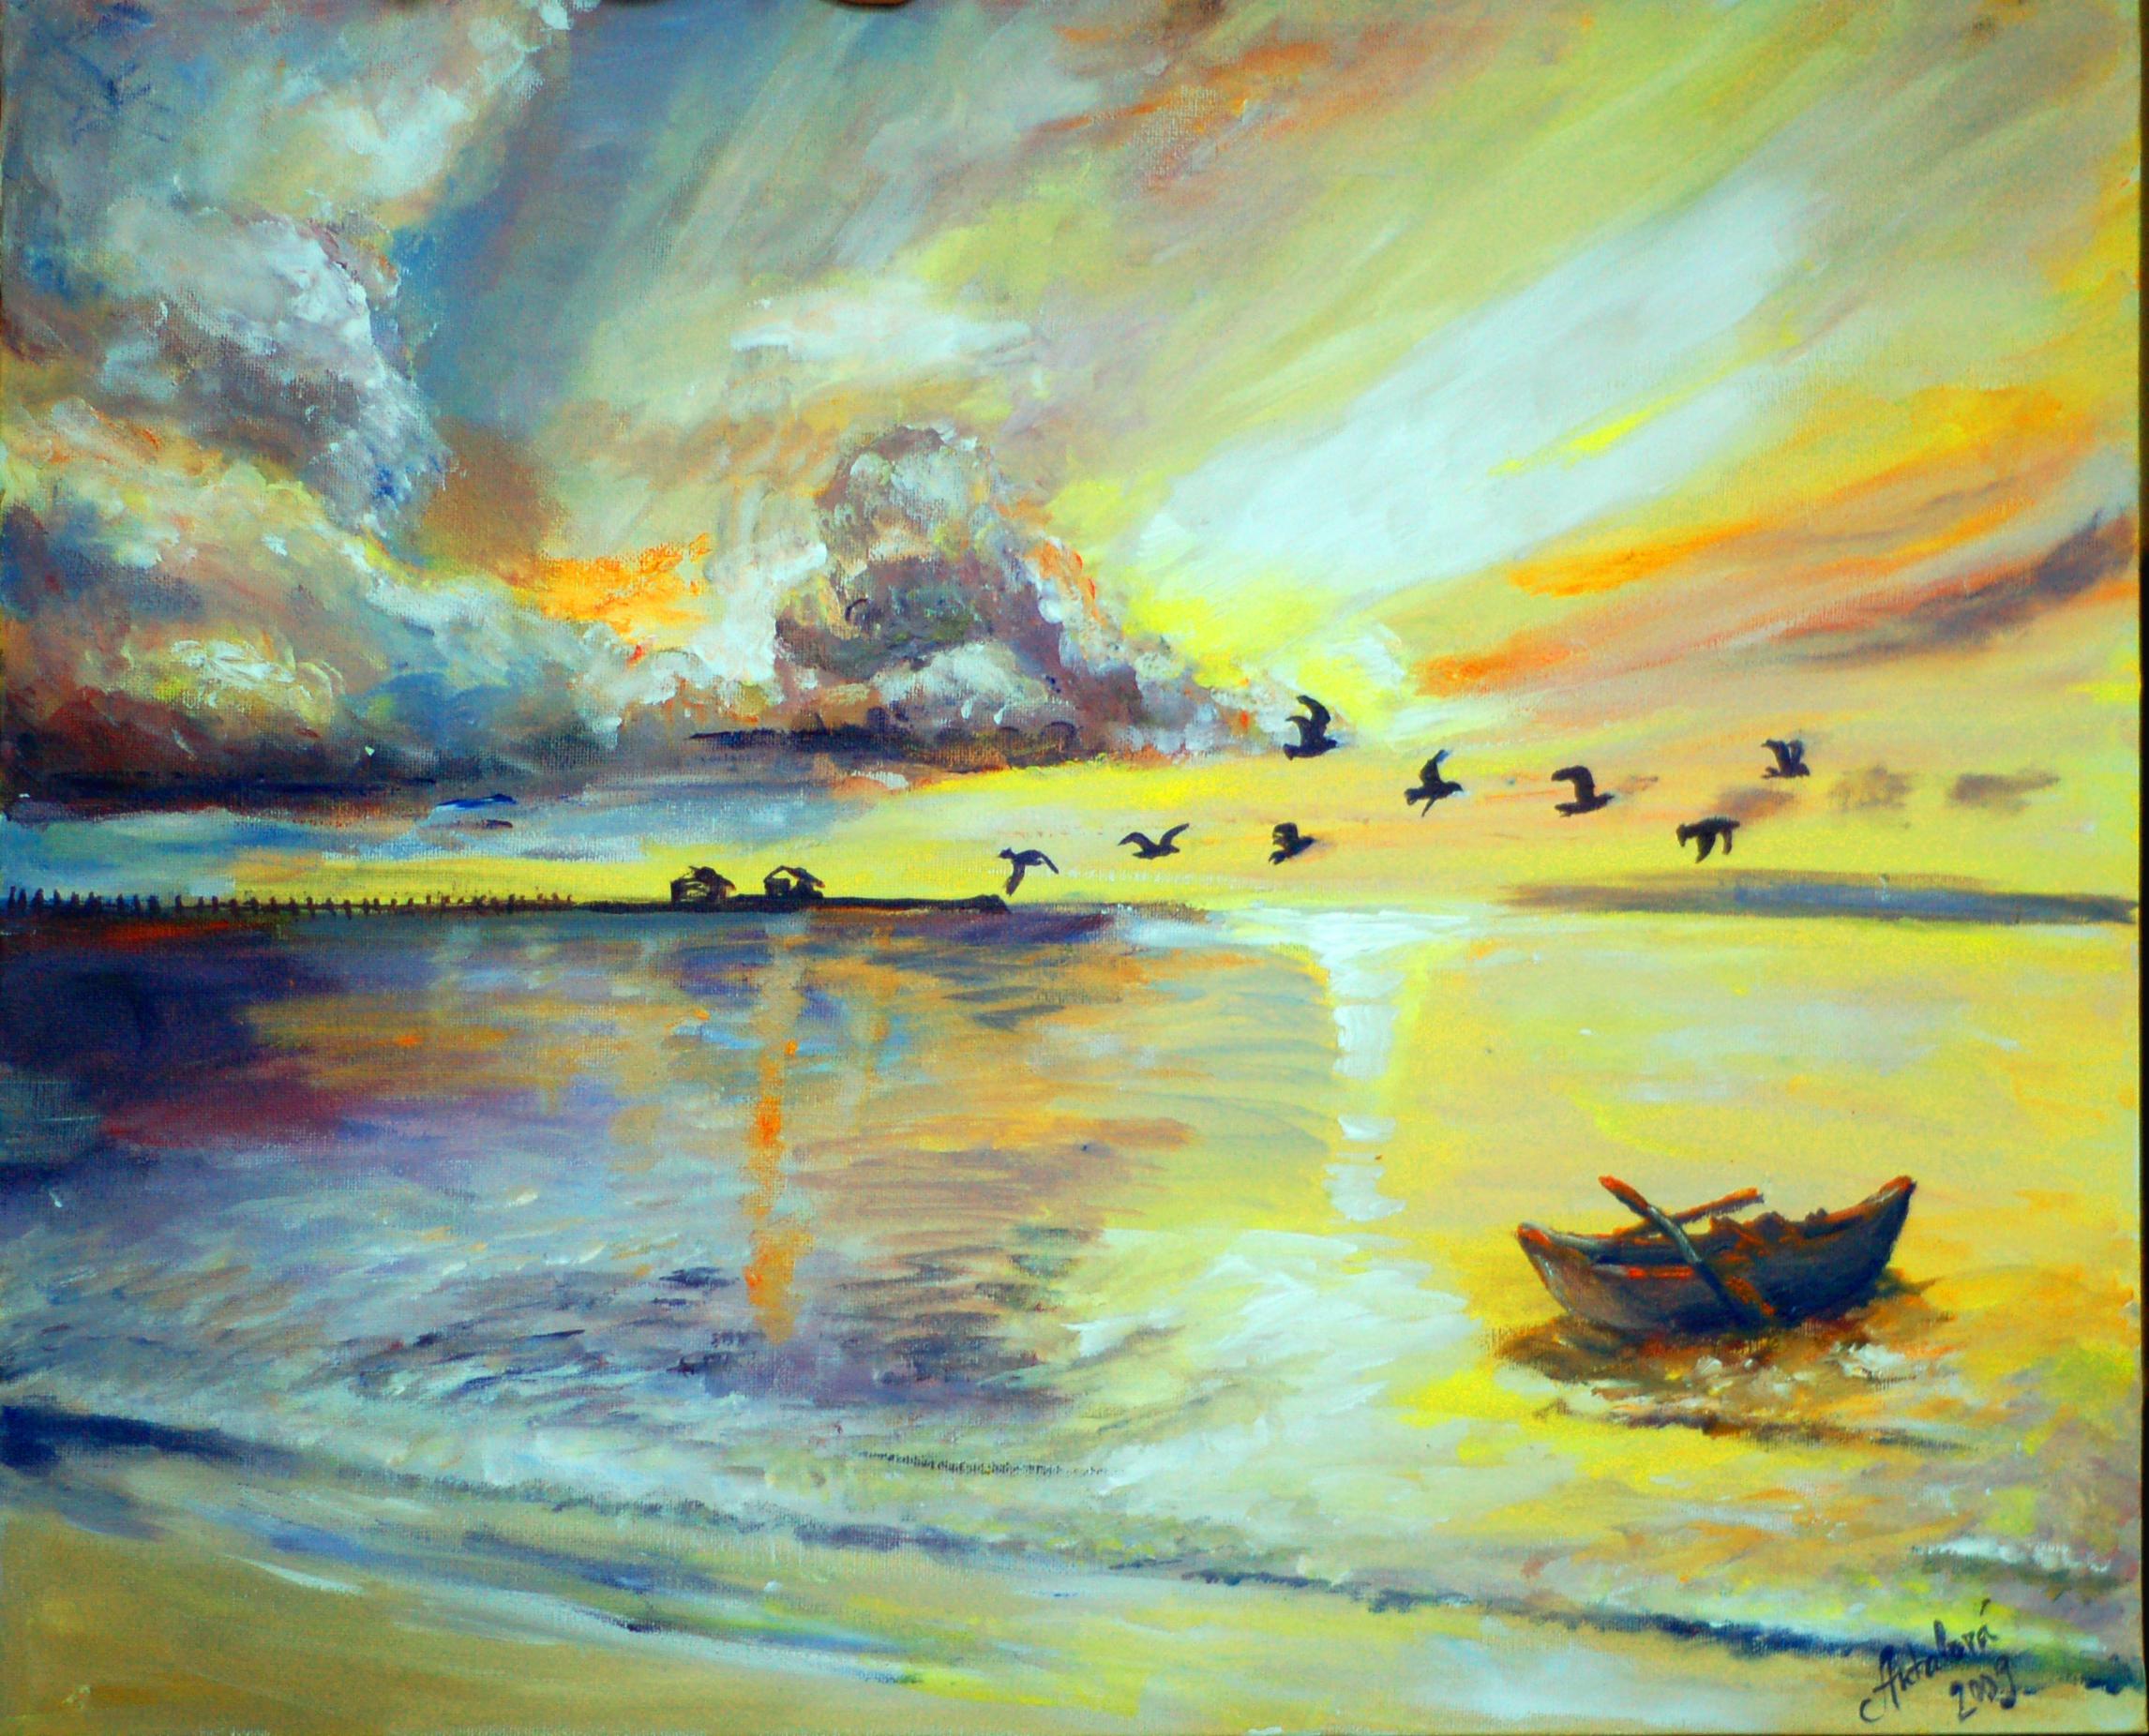 Západ slnka na mori